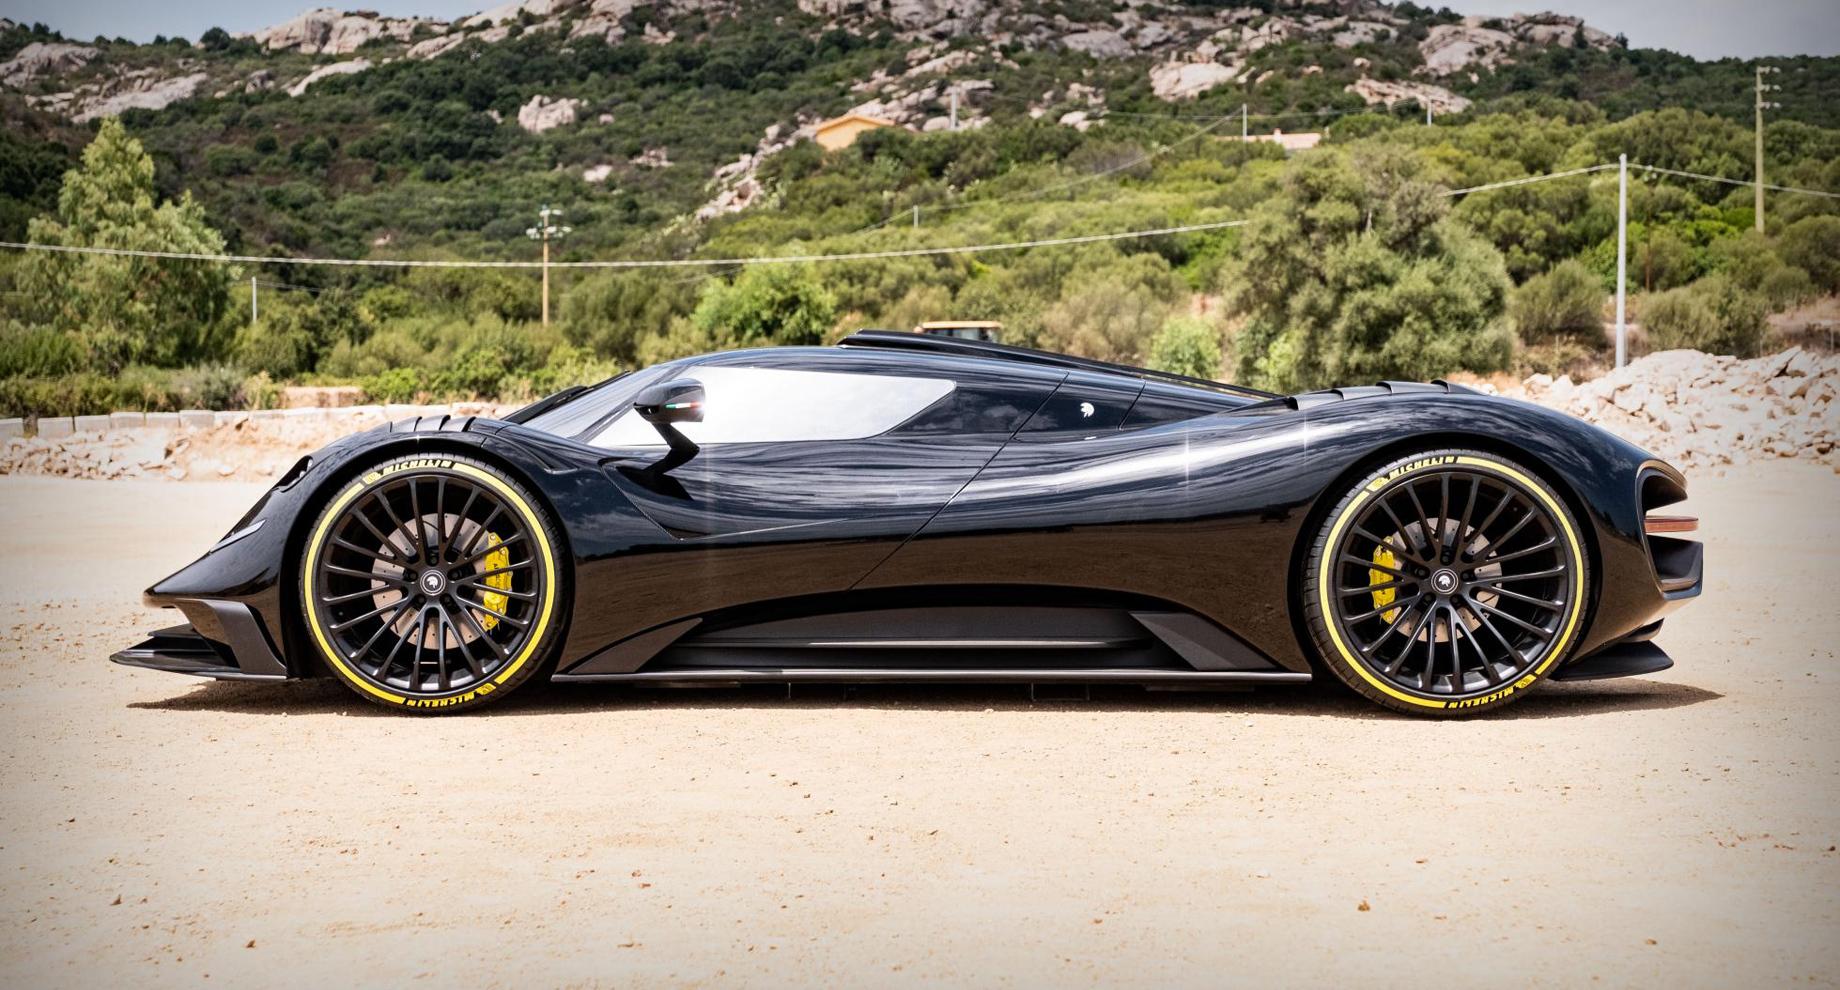 Суперкар Ares S Project облёк Corvette вяркую оболочку